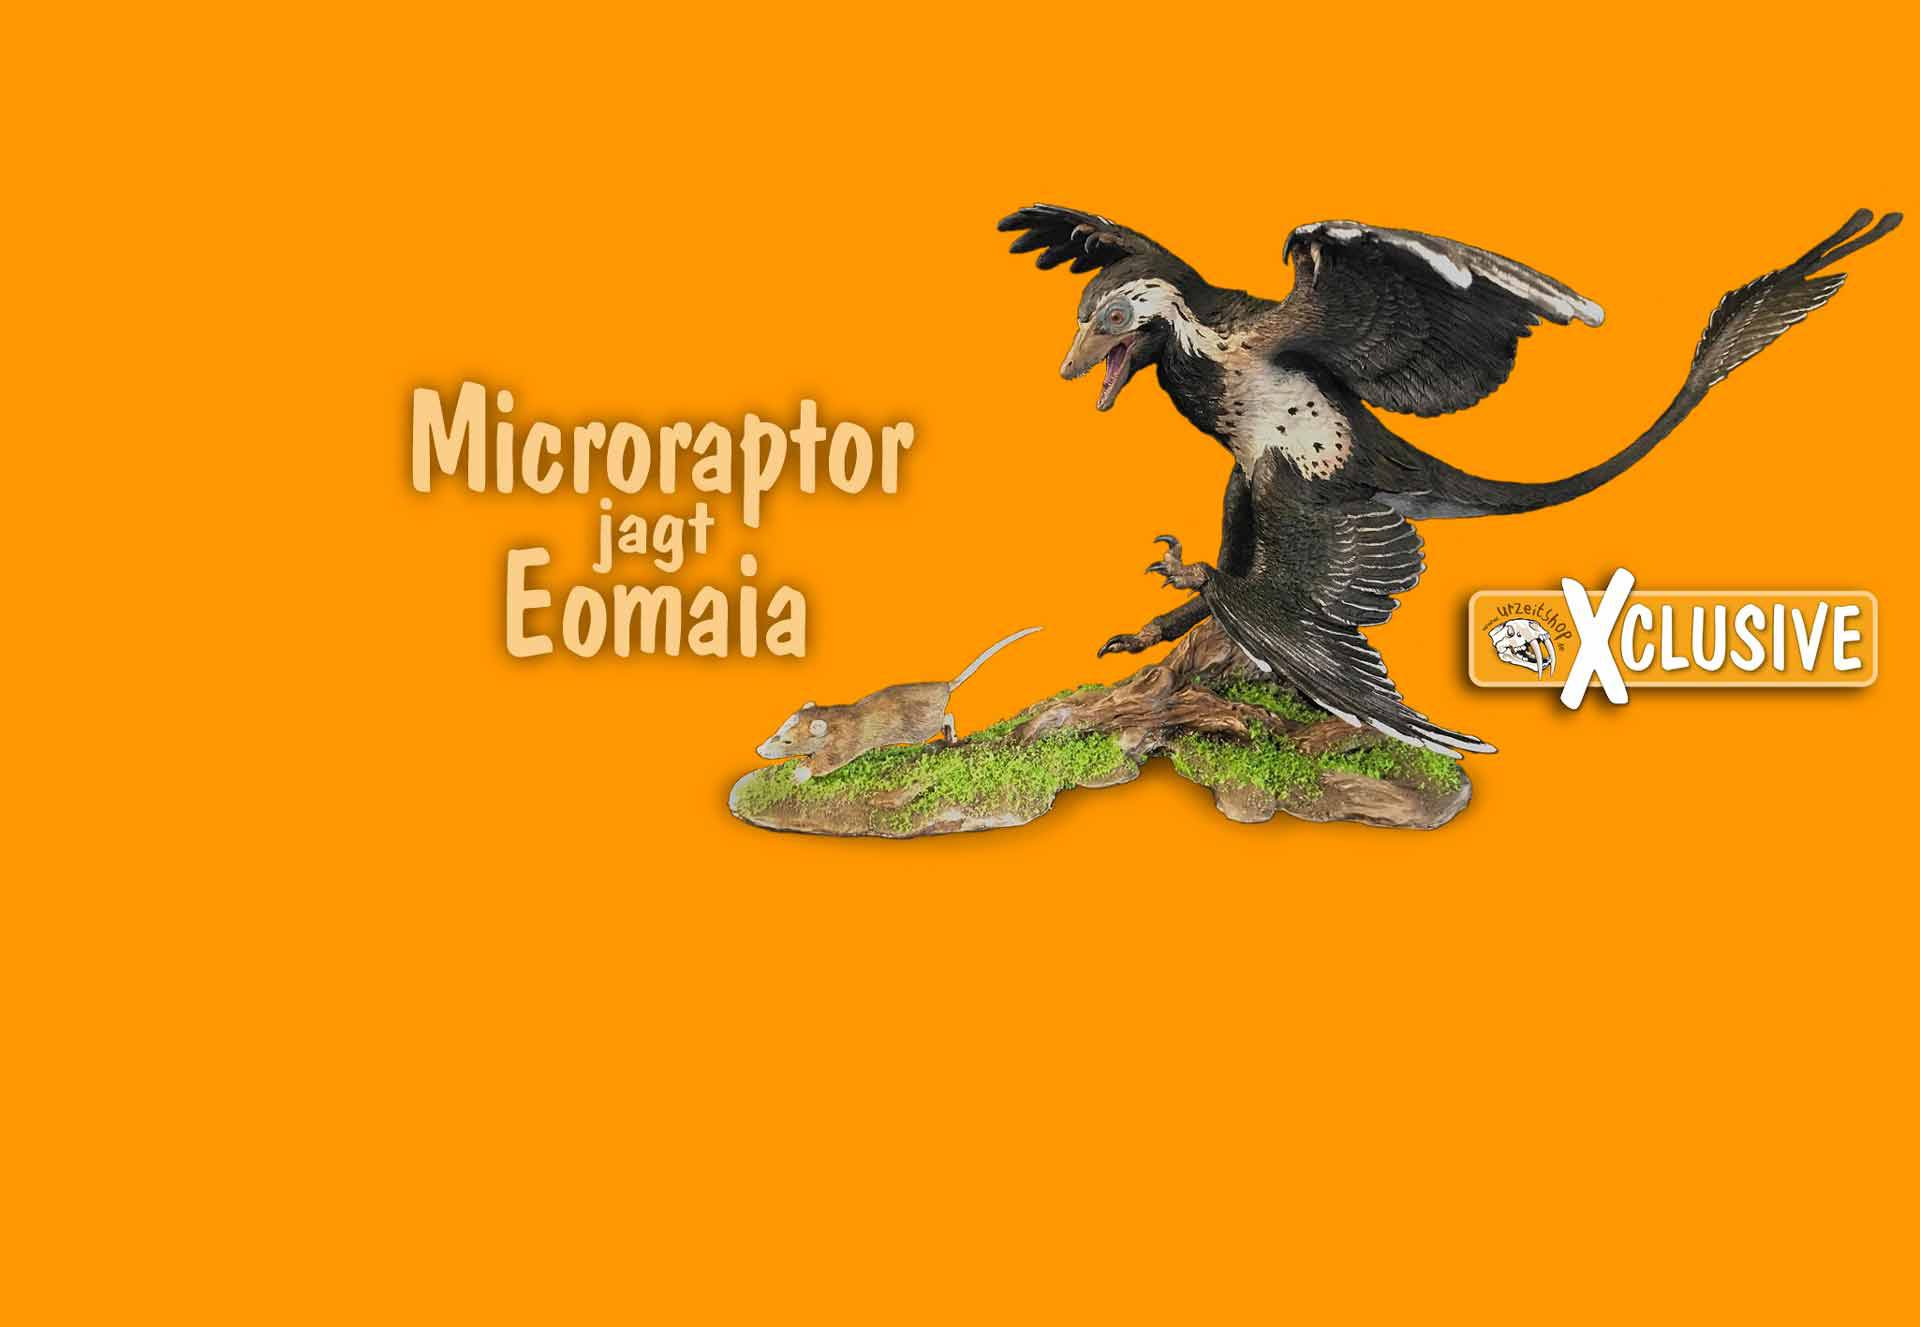 Microraptor jagt Eomaia